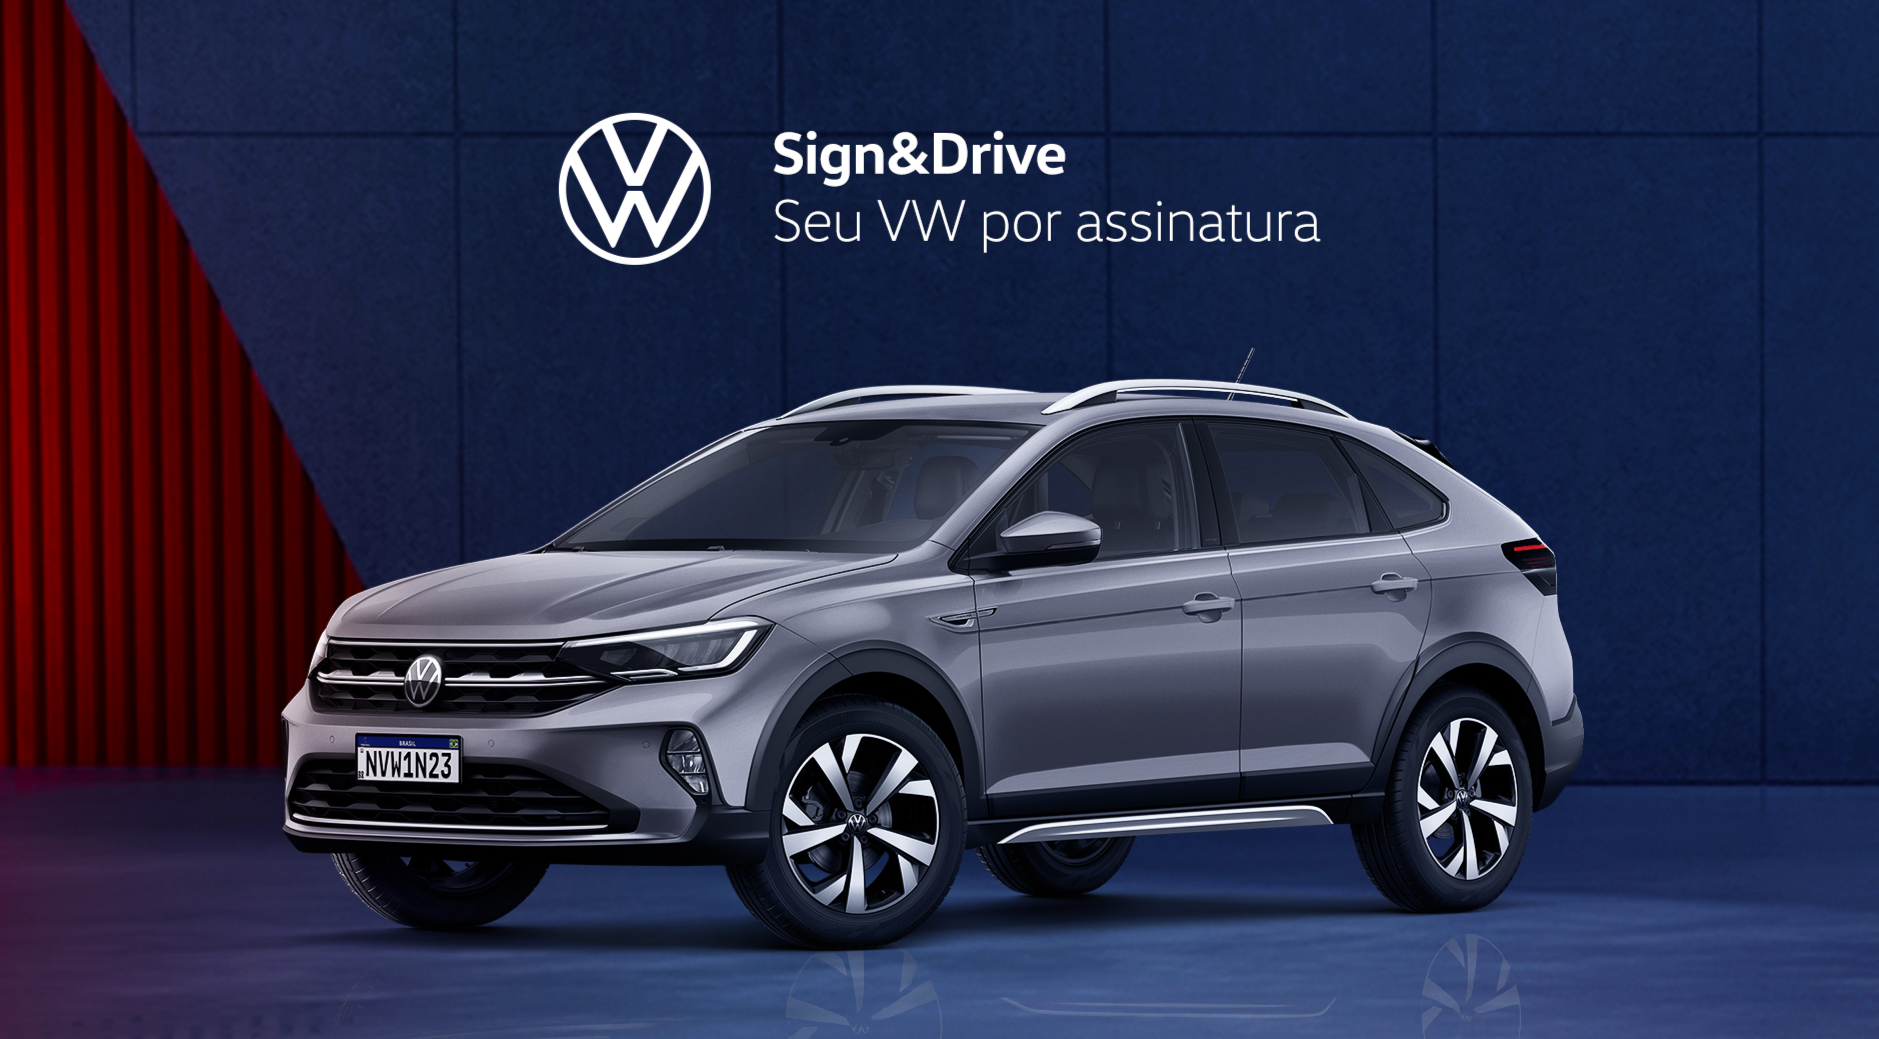 volkswagen nivus prata visto de lado em propaganda de carros por assinatura